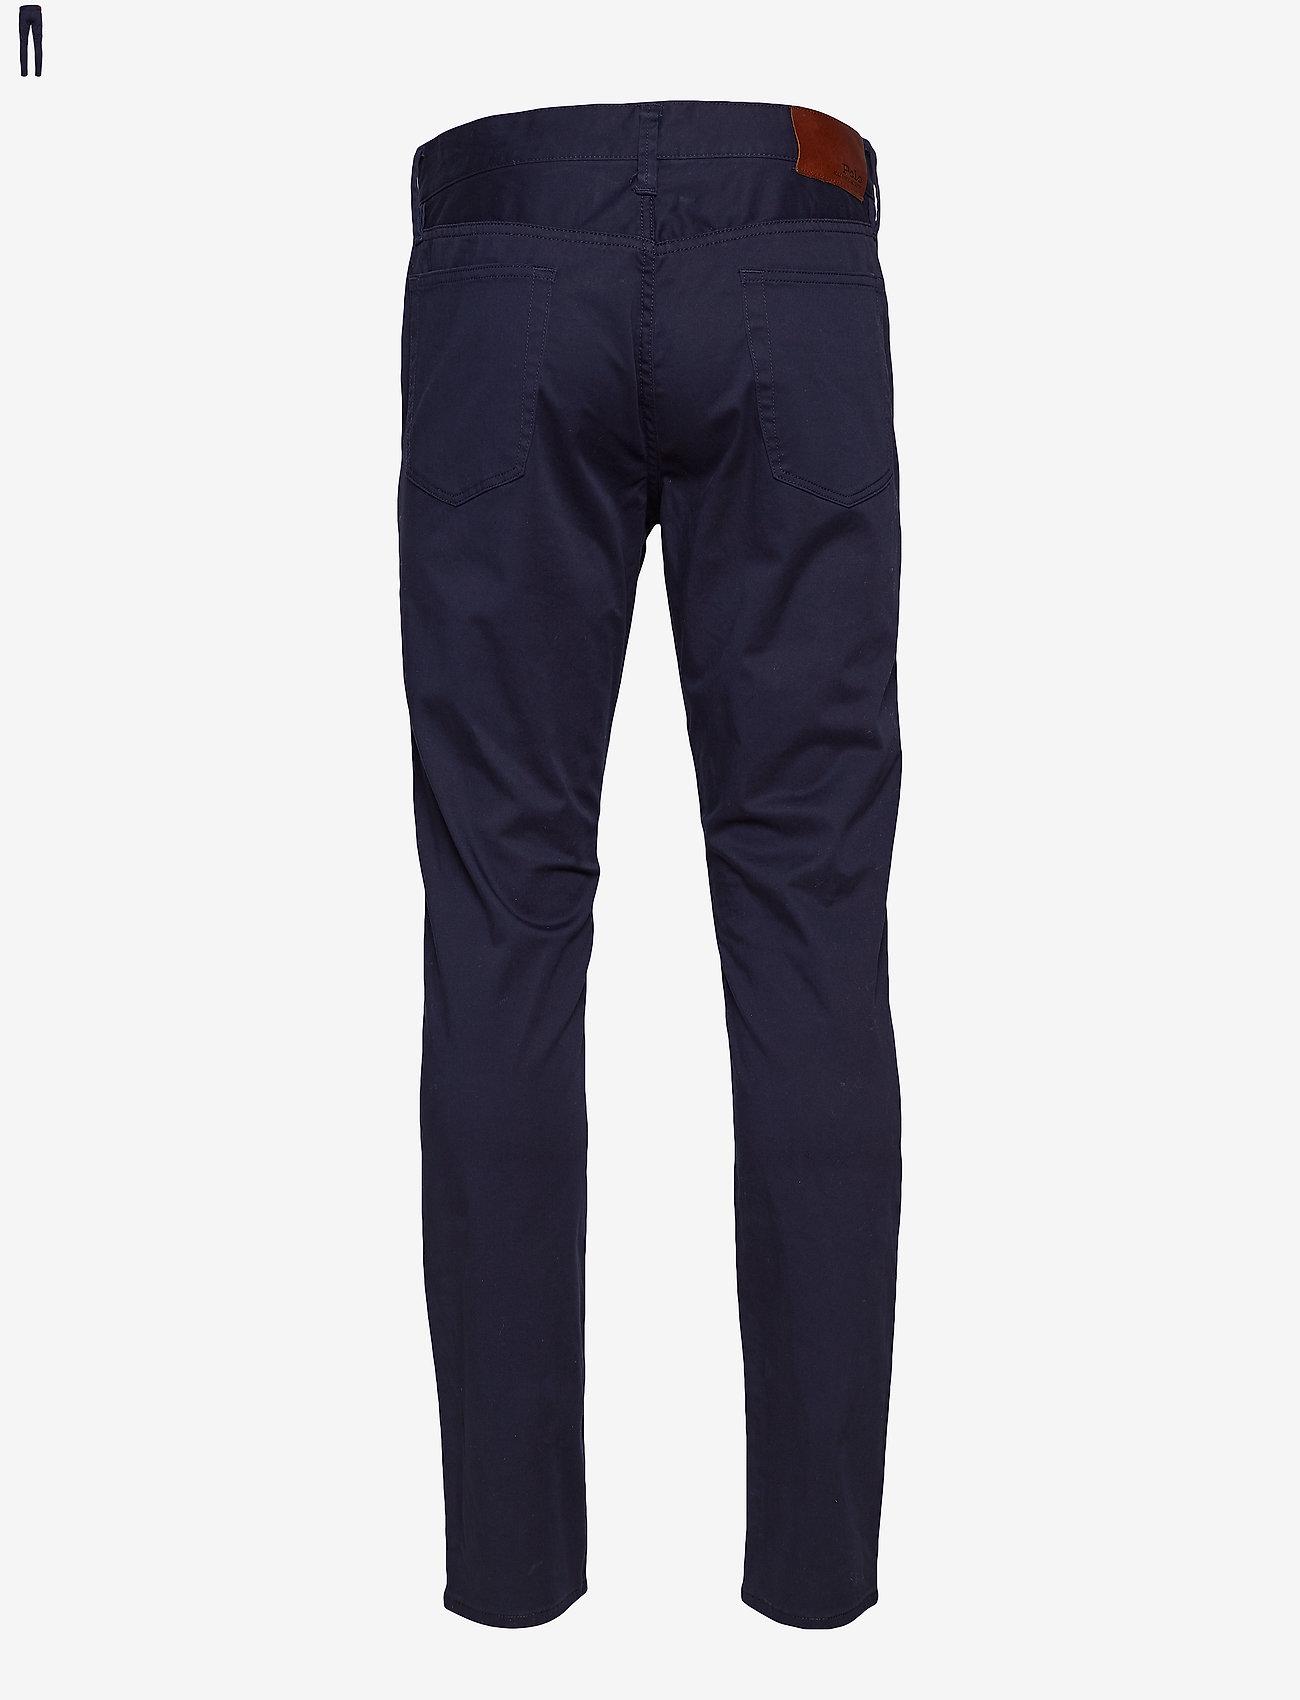 Polo Ralph Lauren - Sullivan-5-Pocket Slim Pant - rennot - collection navy - 1